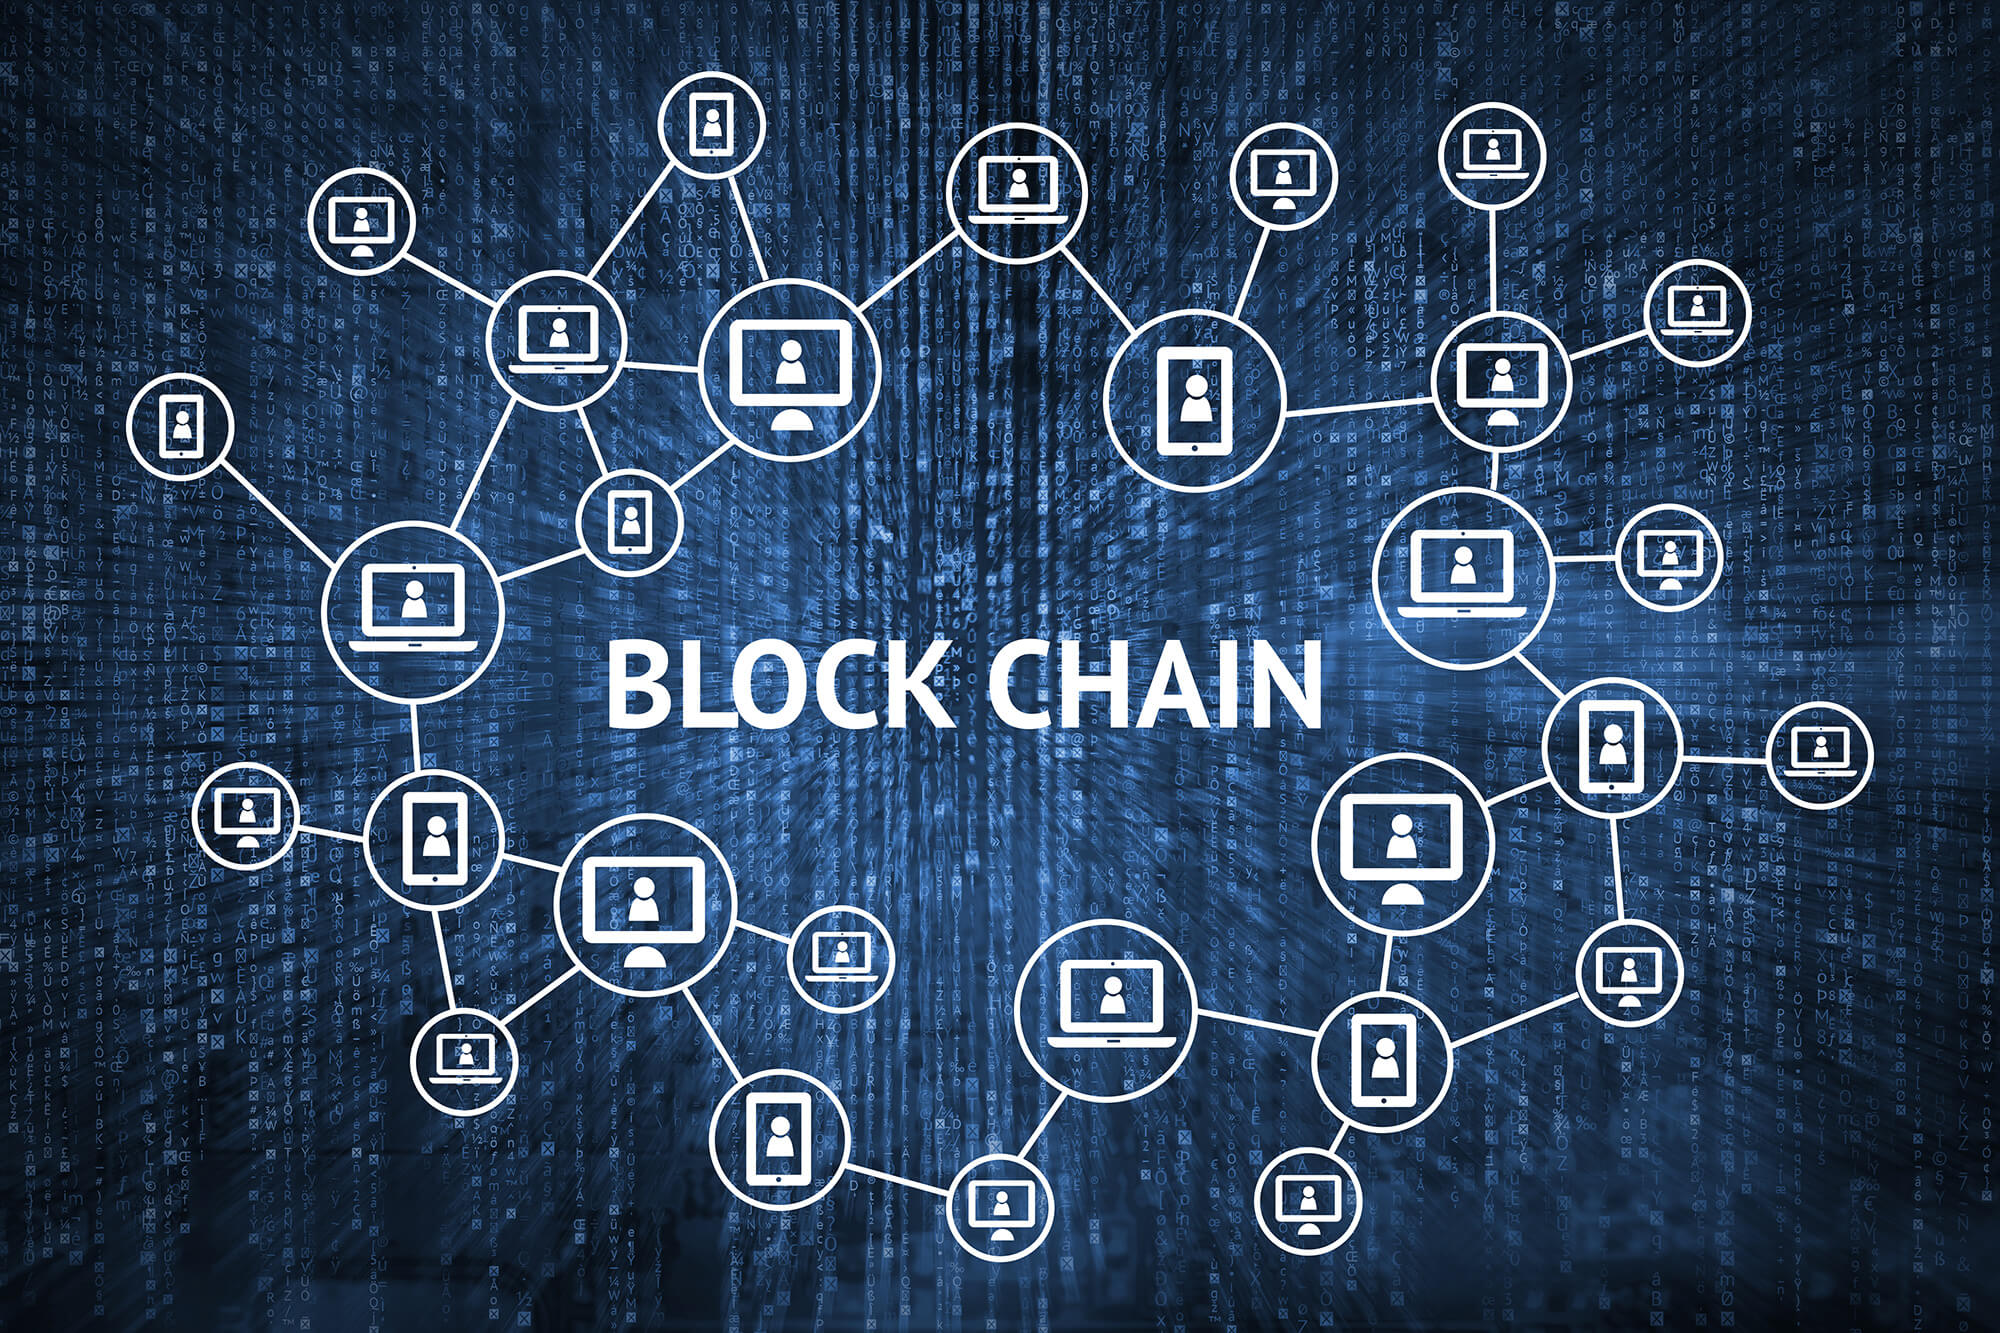 blockchain-releases-brand-new-cryptocurrency-exchange